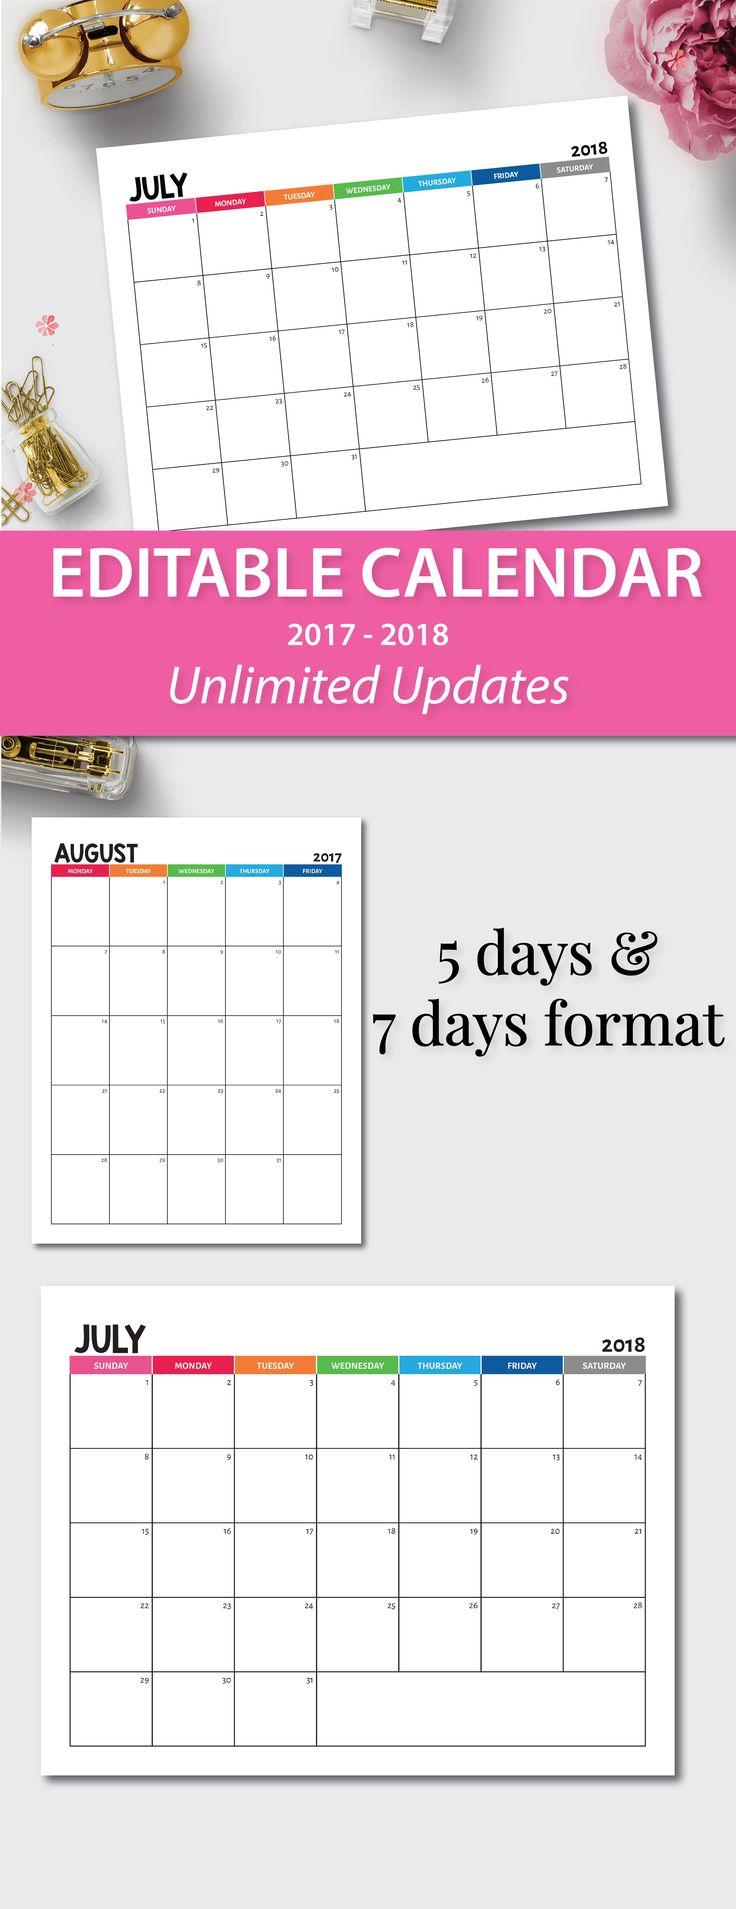 Kindergarten Calendar Powerpoint : The best editable calendar ideas on pinterest